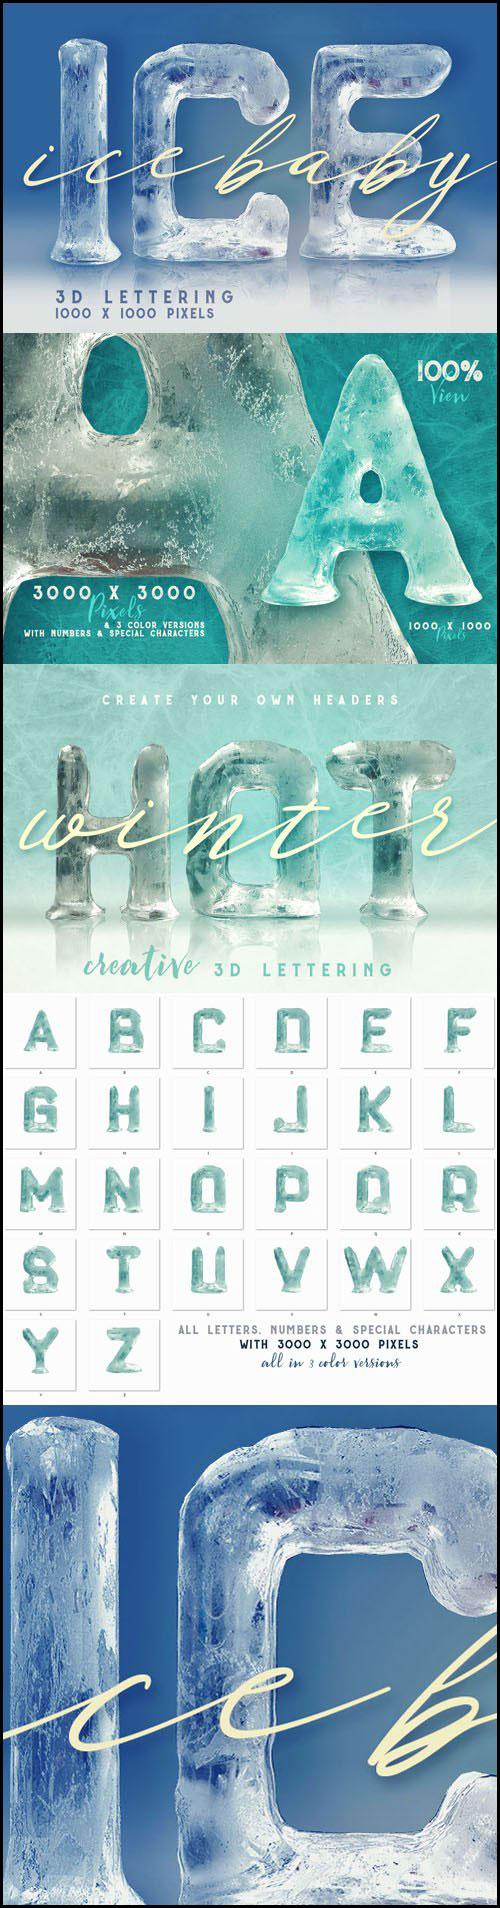 دانلود تصاویر حروف انگلیسی طرح یخ